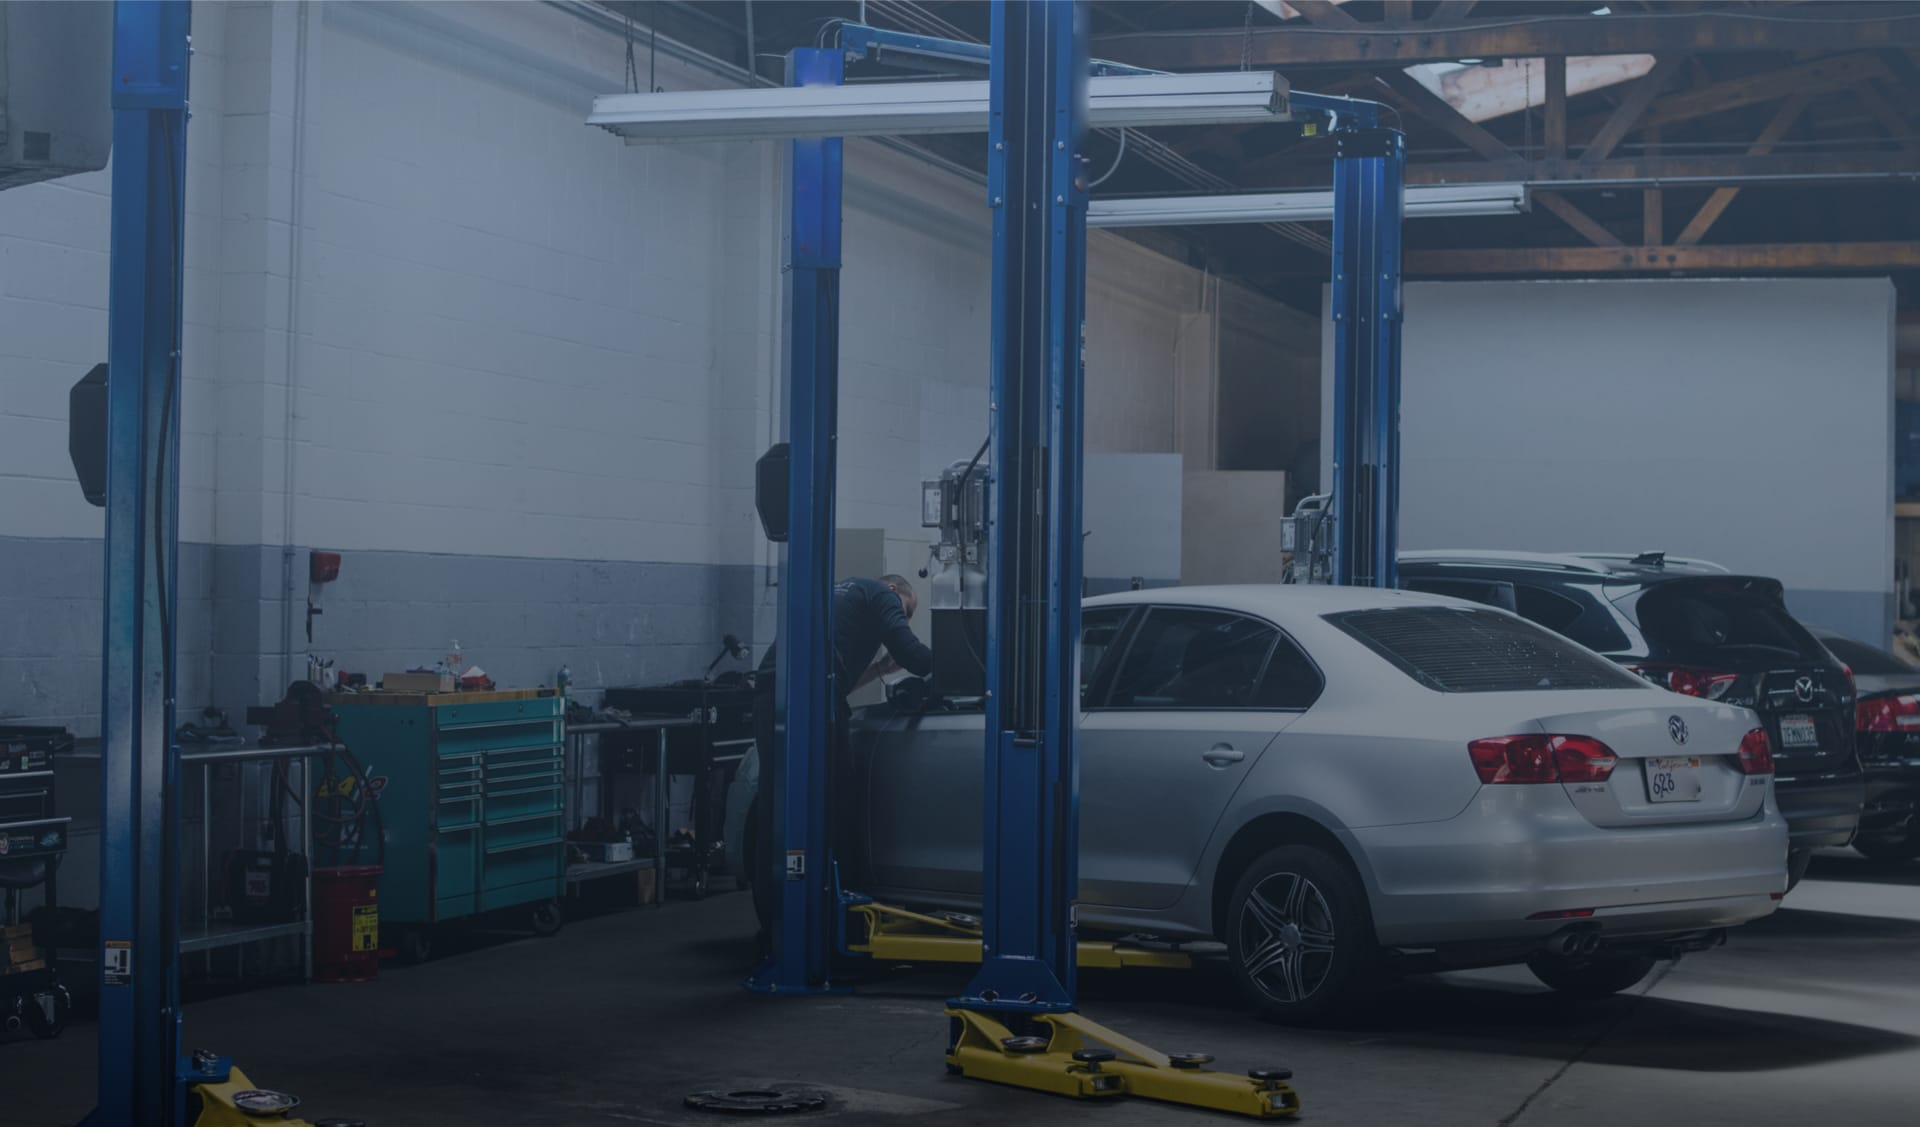 car_repair_shop-72_comp